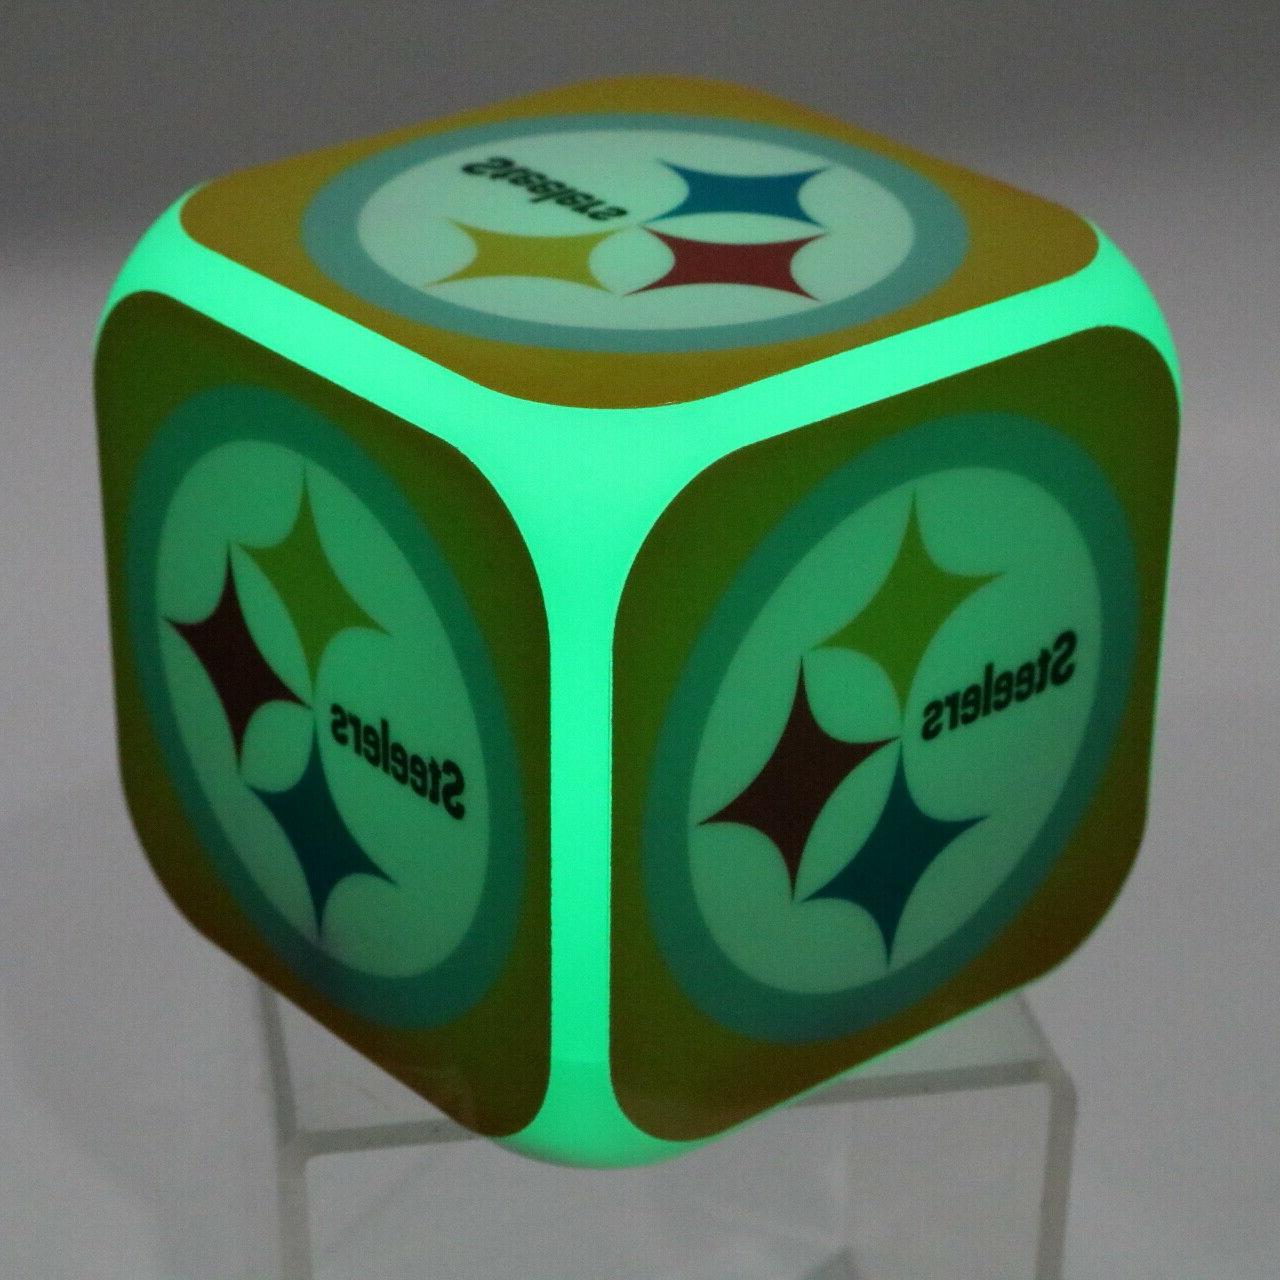 Pittsburgh Steelers Digital Alarm Watch Lamp Decor Roethlisberger Gift